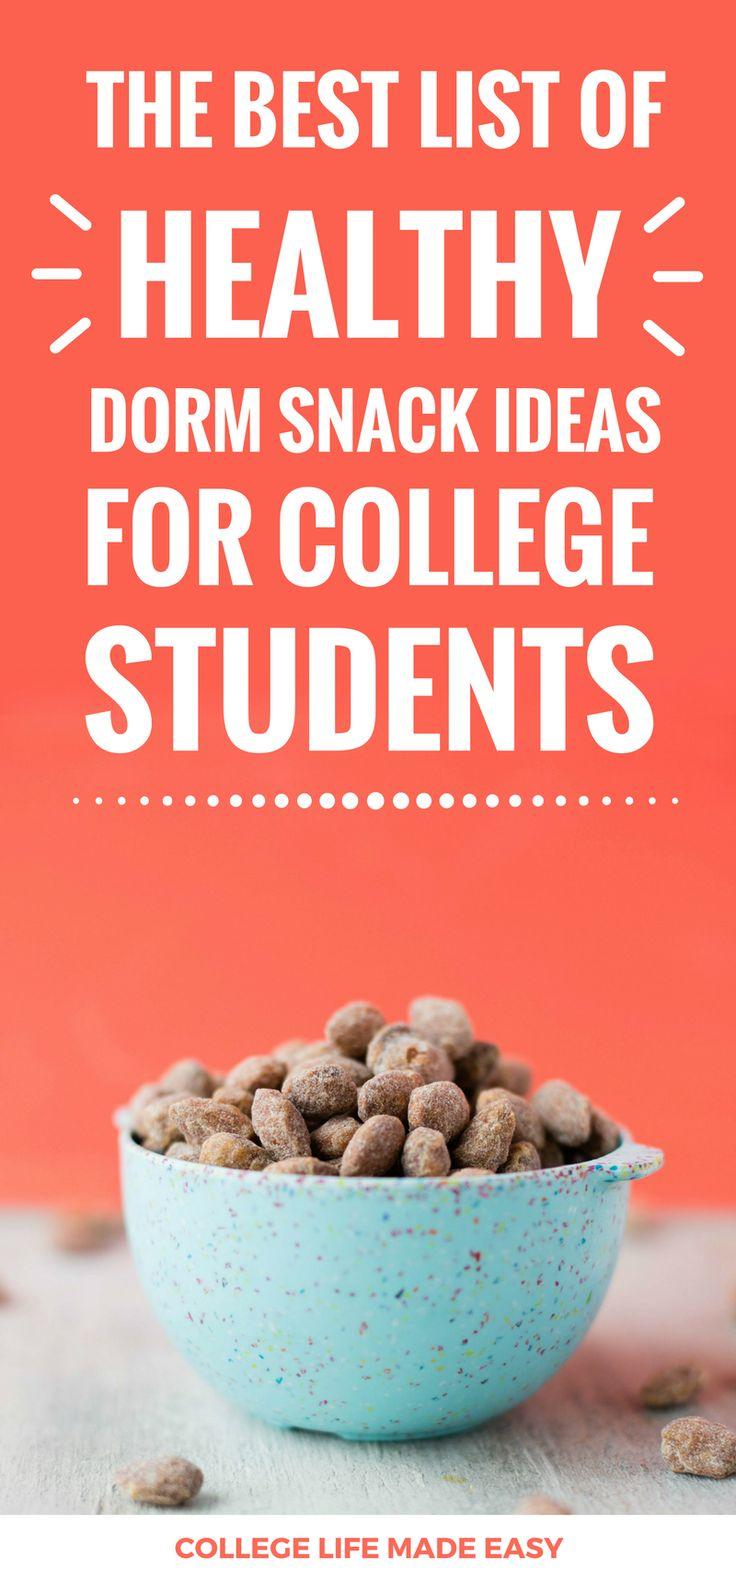 College Student Dorm Snacks Ideas / Best List of Healthy Foods to Buy / #snack #snackgoals #college #student #dorm #dormlife #snackattack #collegelife #collegetips via @esycollegelife